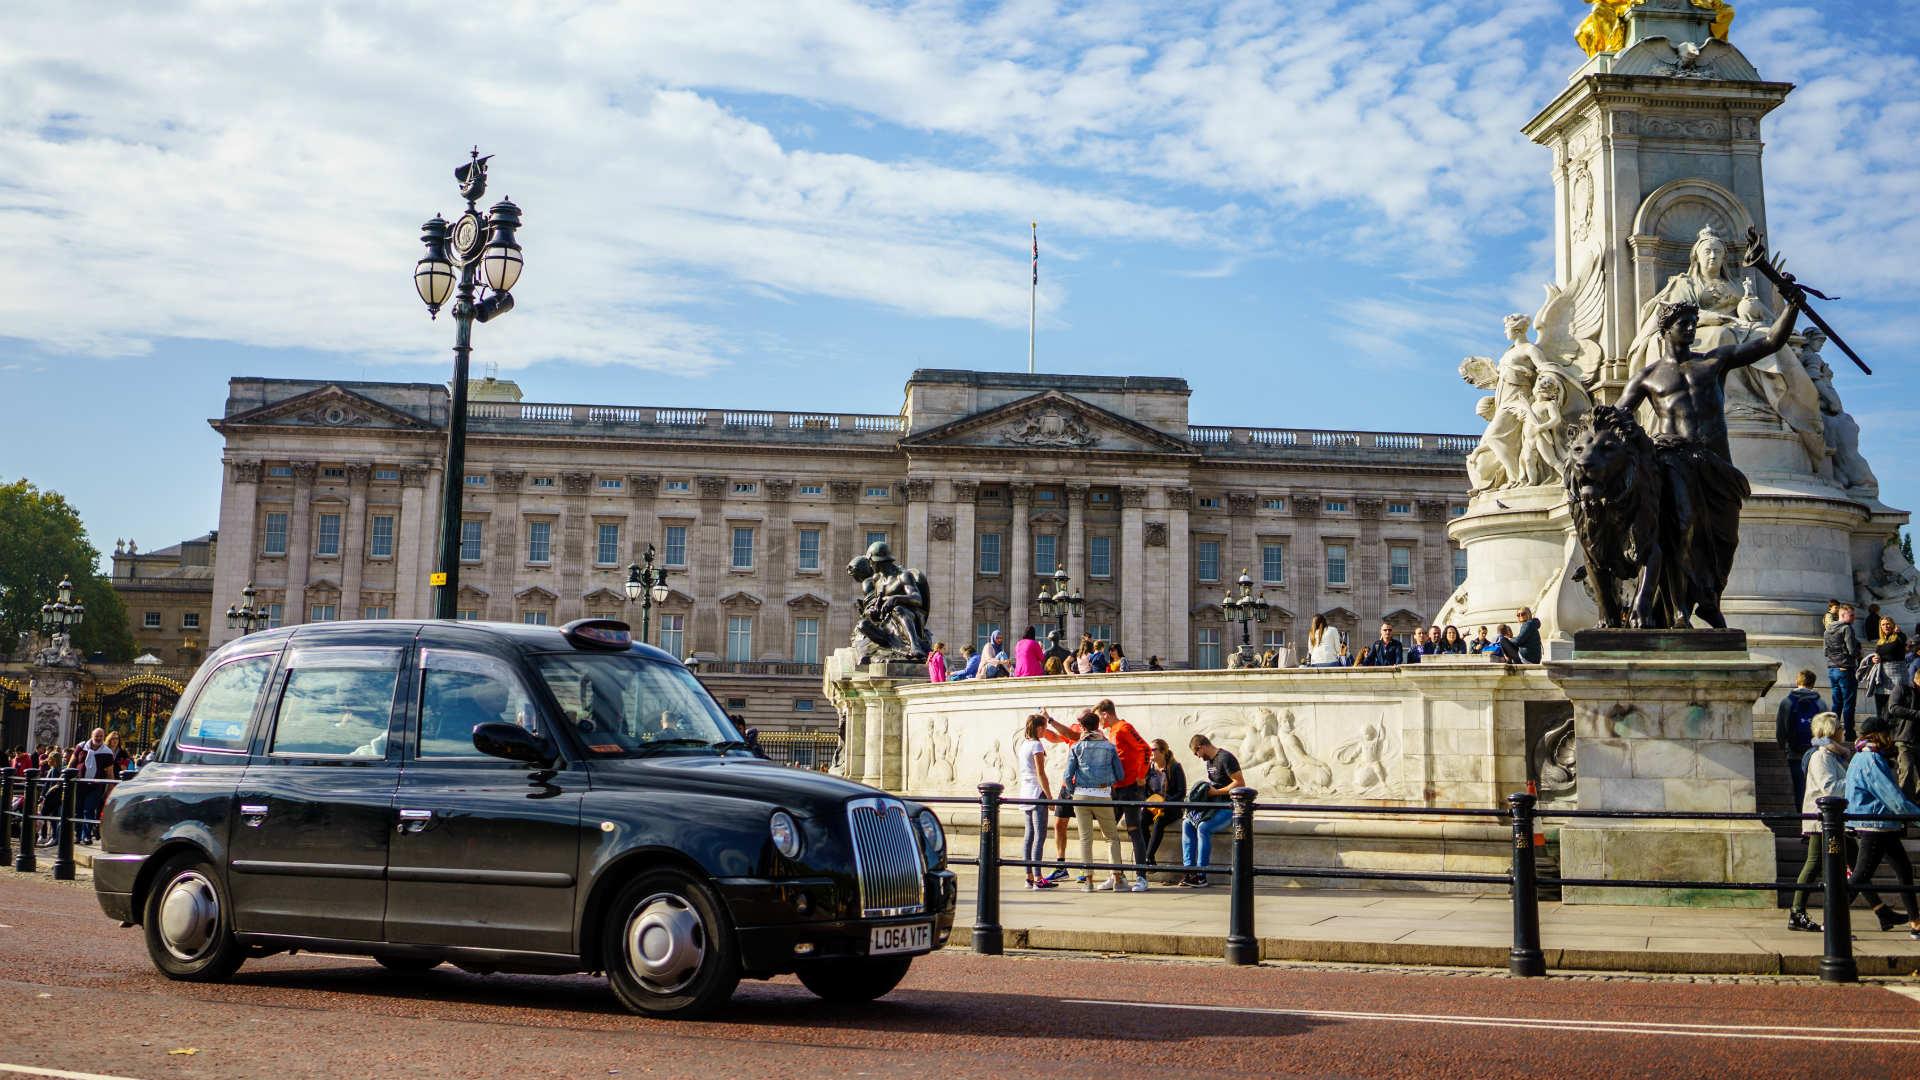 Buckingham Palace dangerous place to drive past